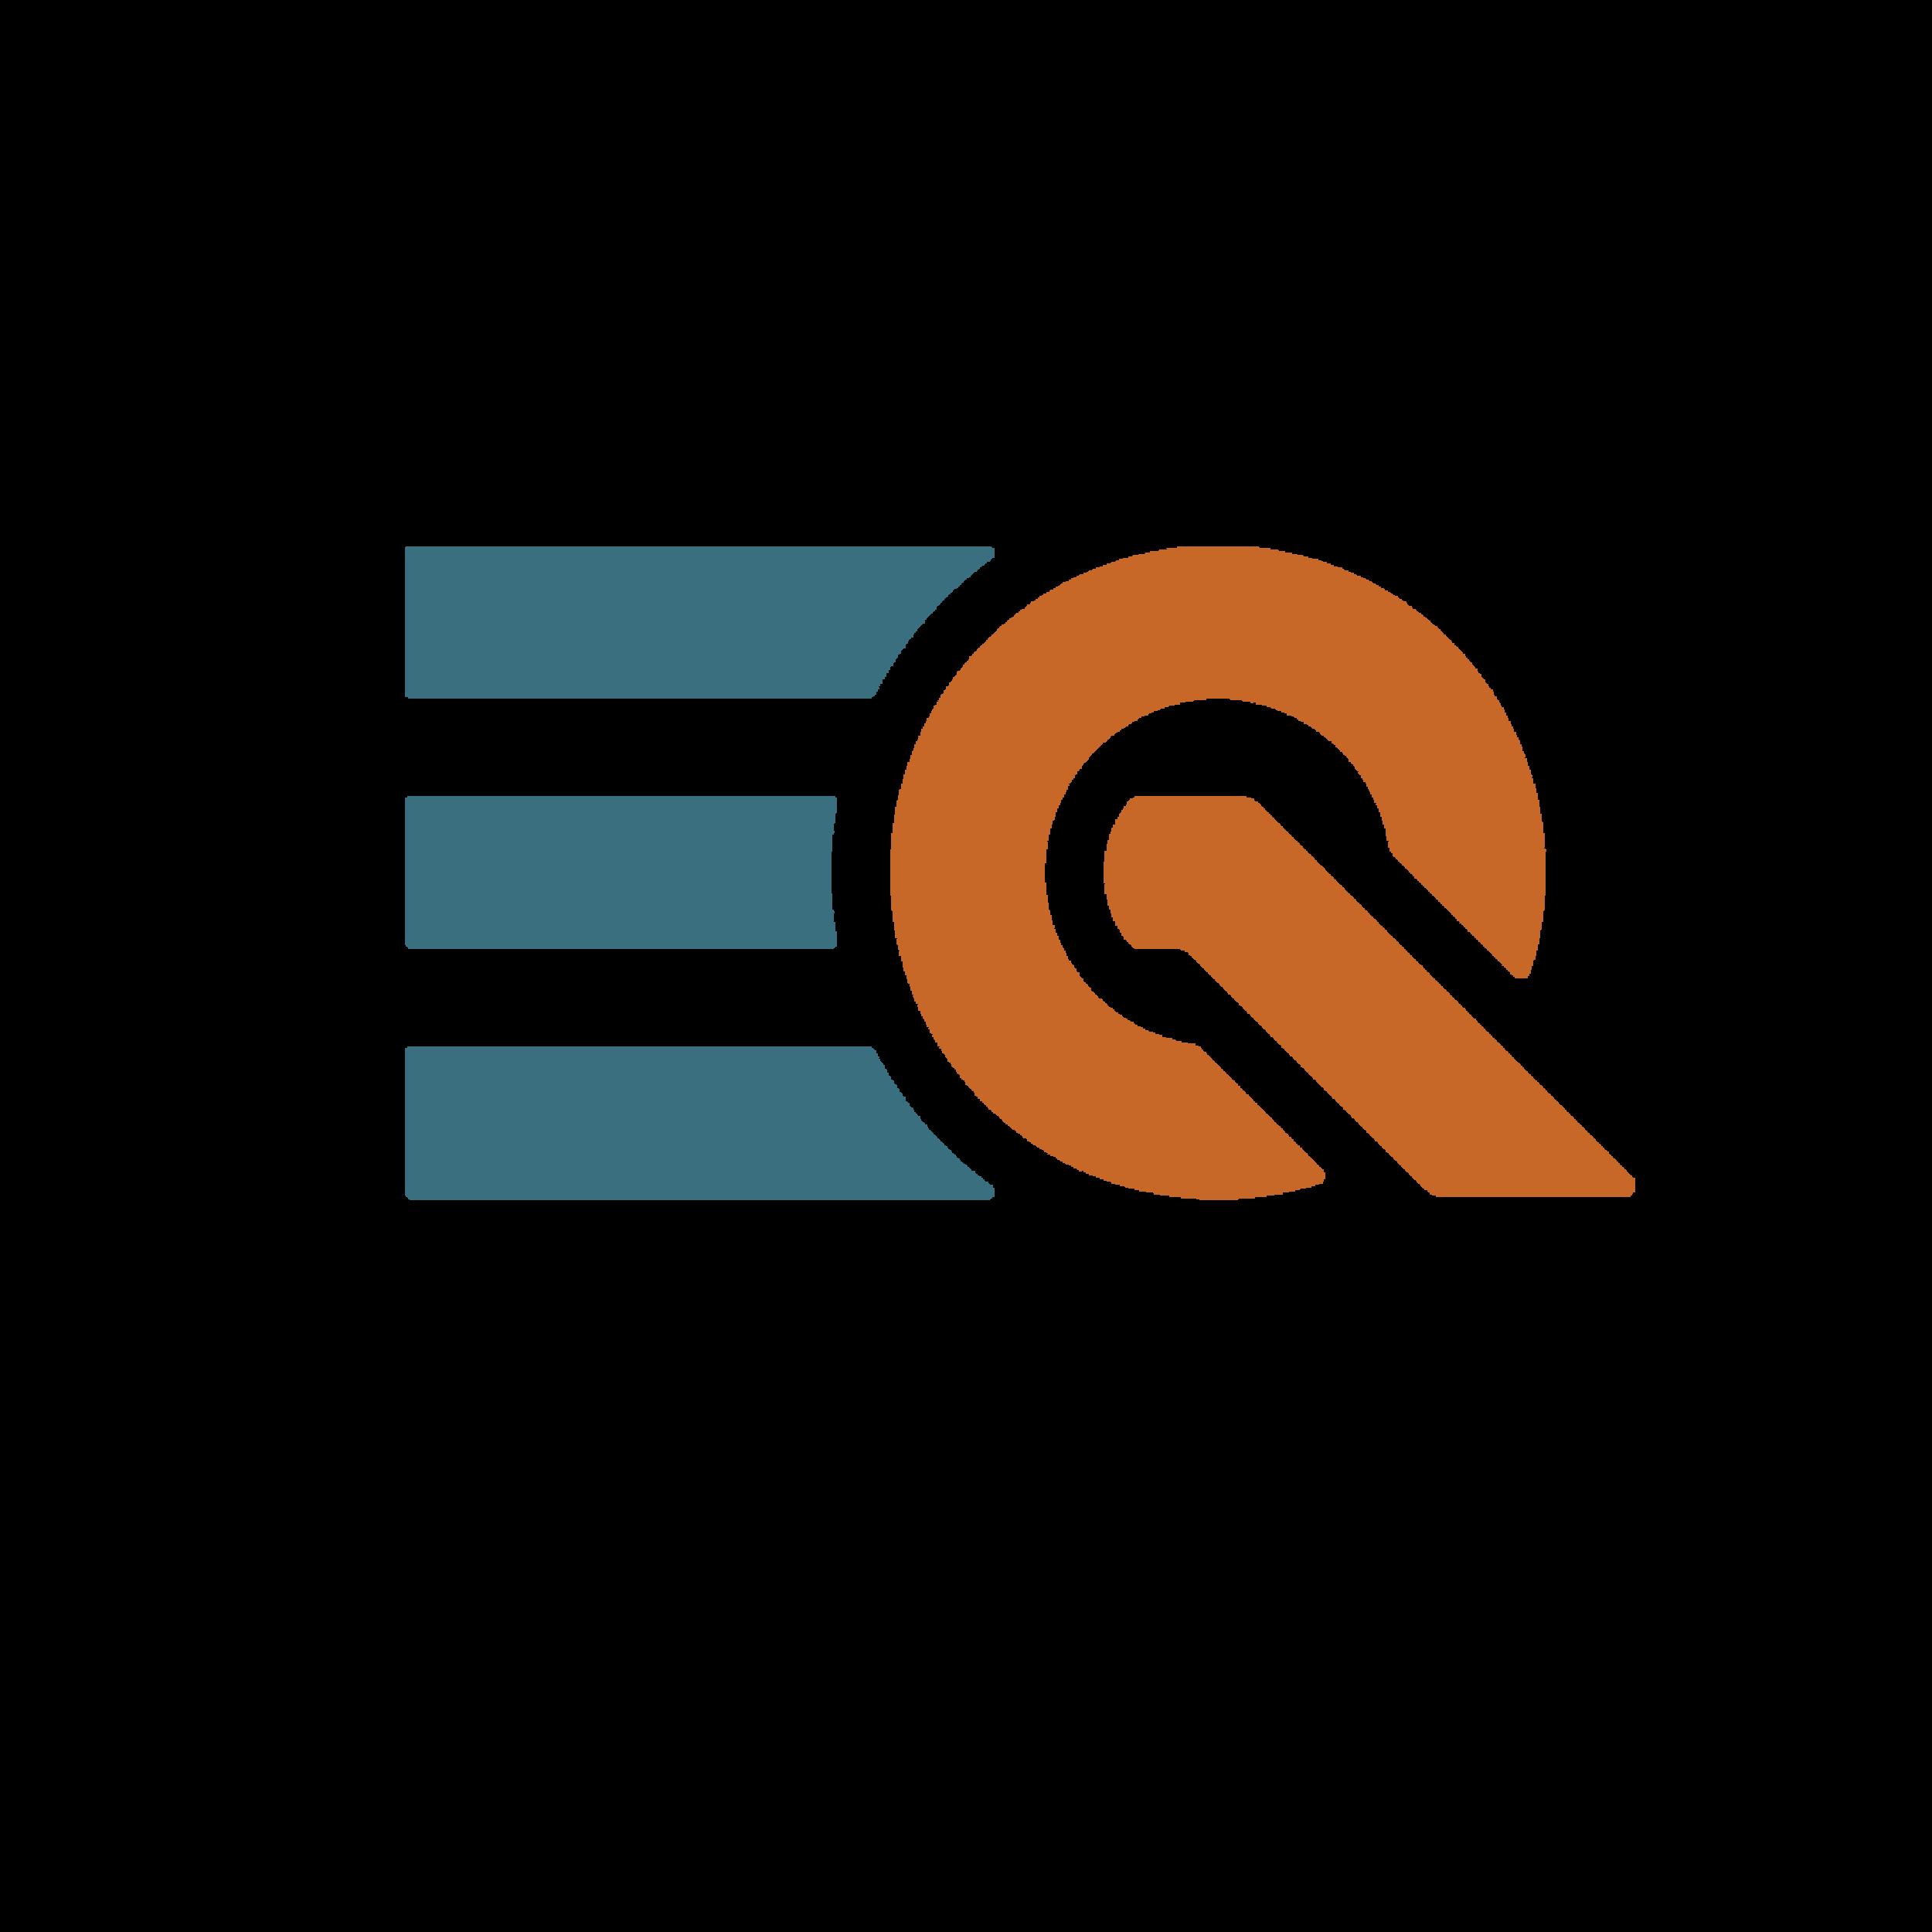 EQ black logo.png